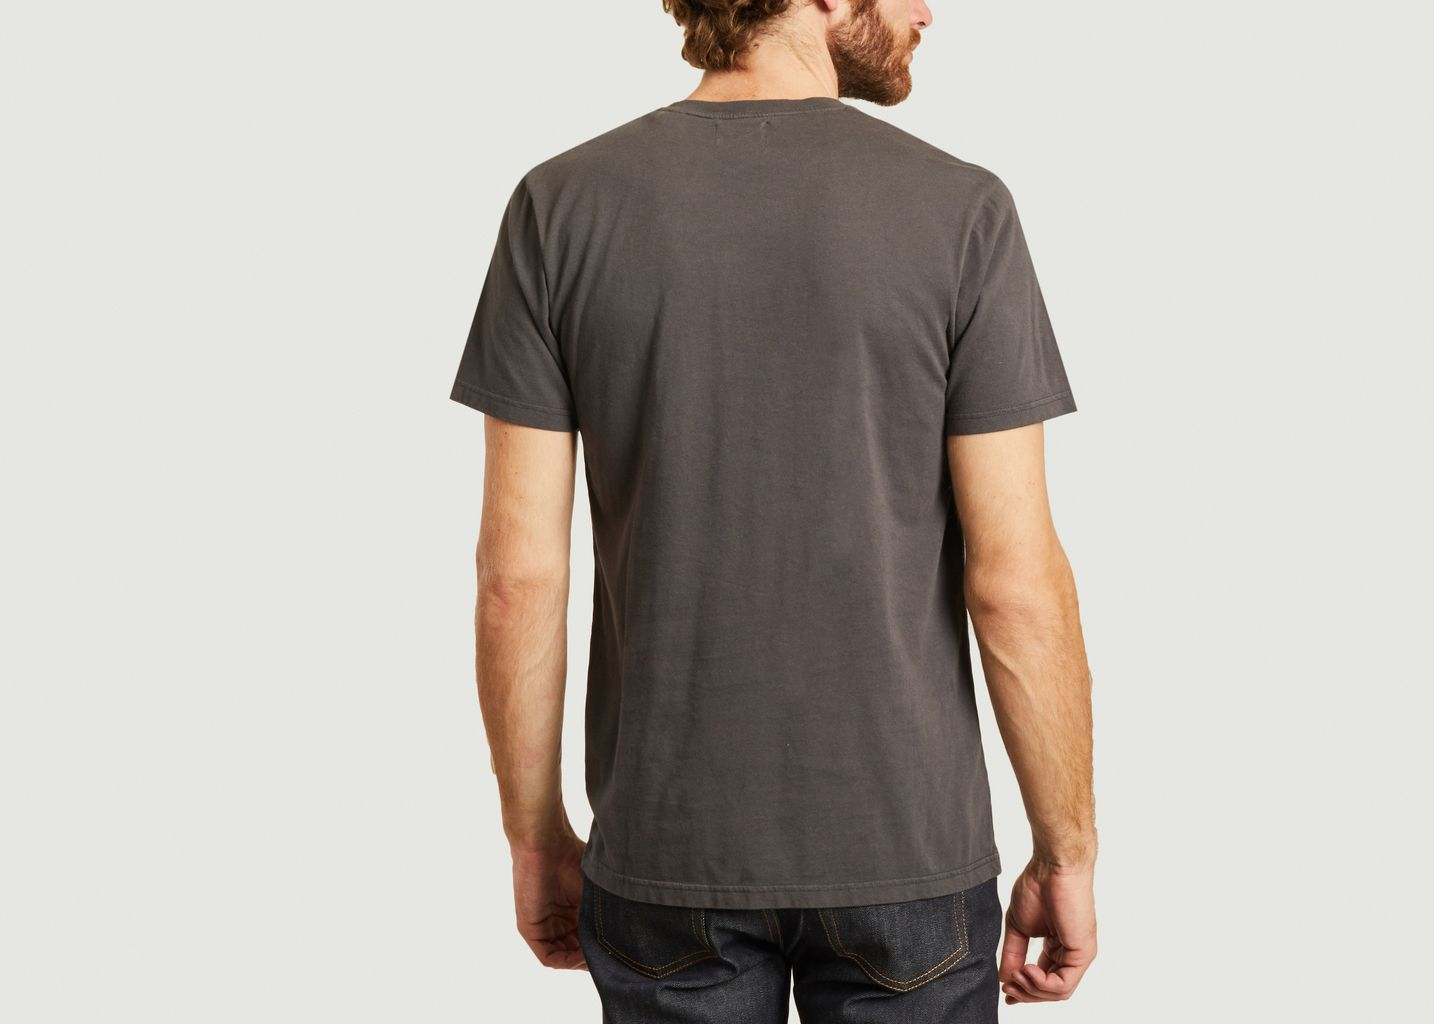 T-shirt Uni - Colorful Standard